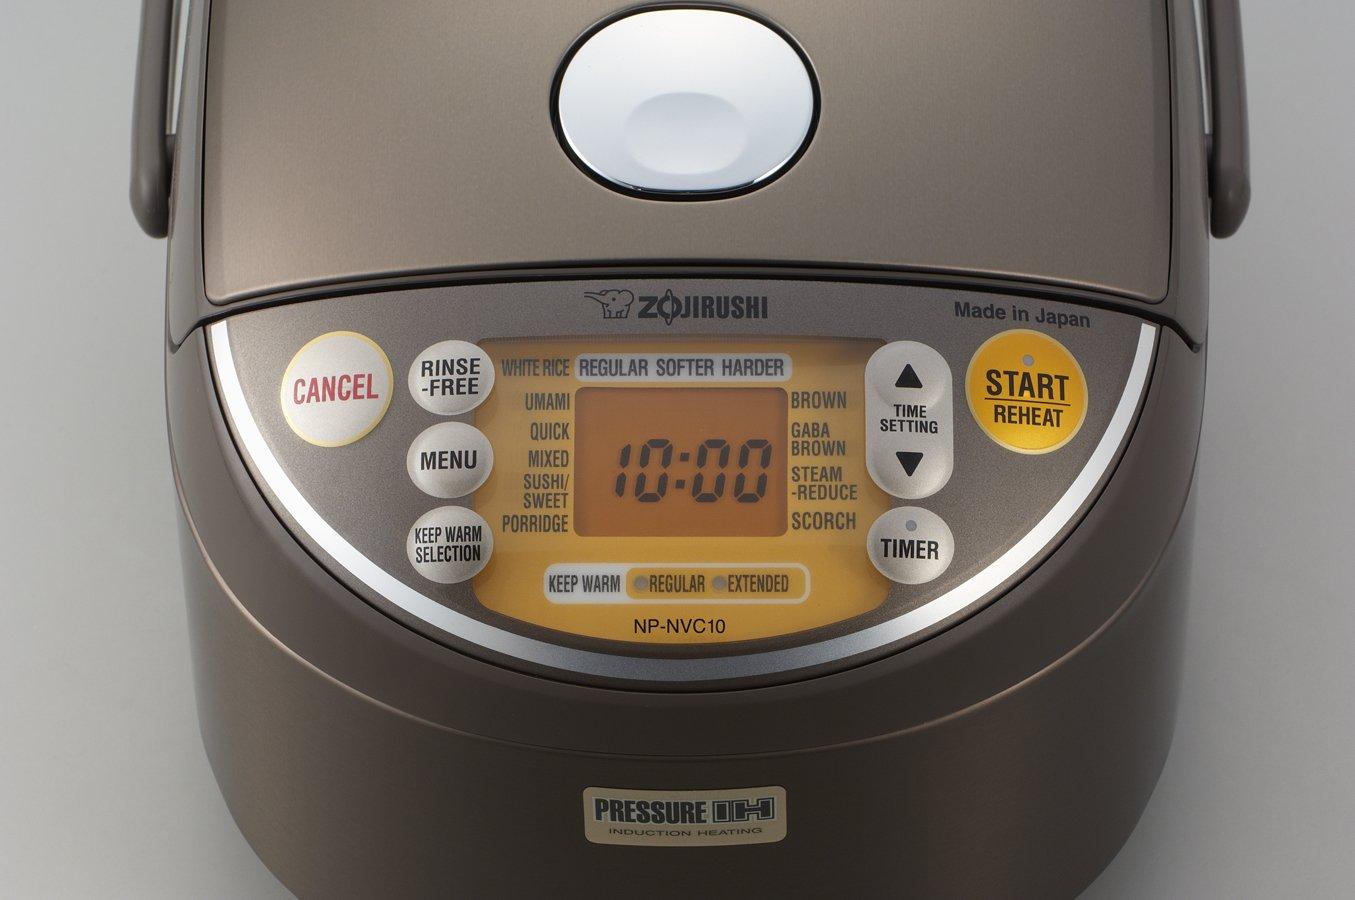 Zojirushi Induction Heating Pressure Rice Cooker & Warmer 1.0 Liter, Stainless Brown NP-NVC10 by Zojirushi